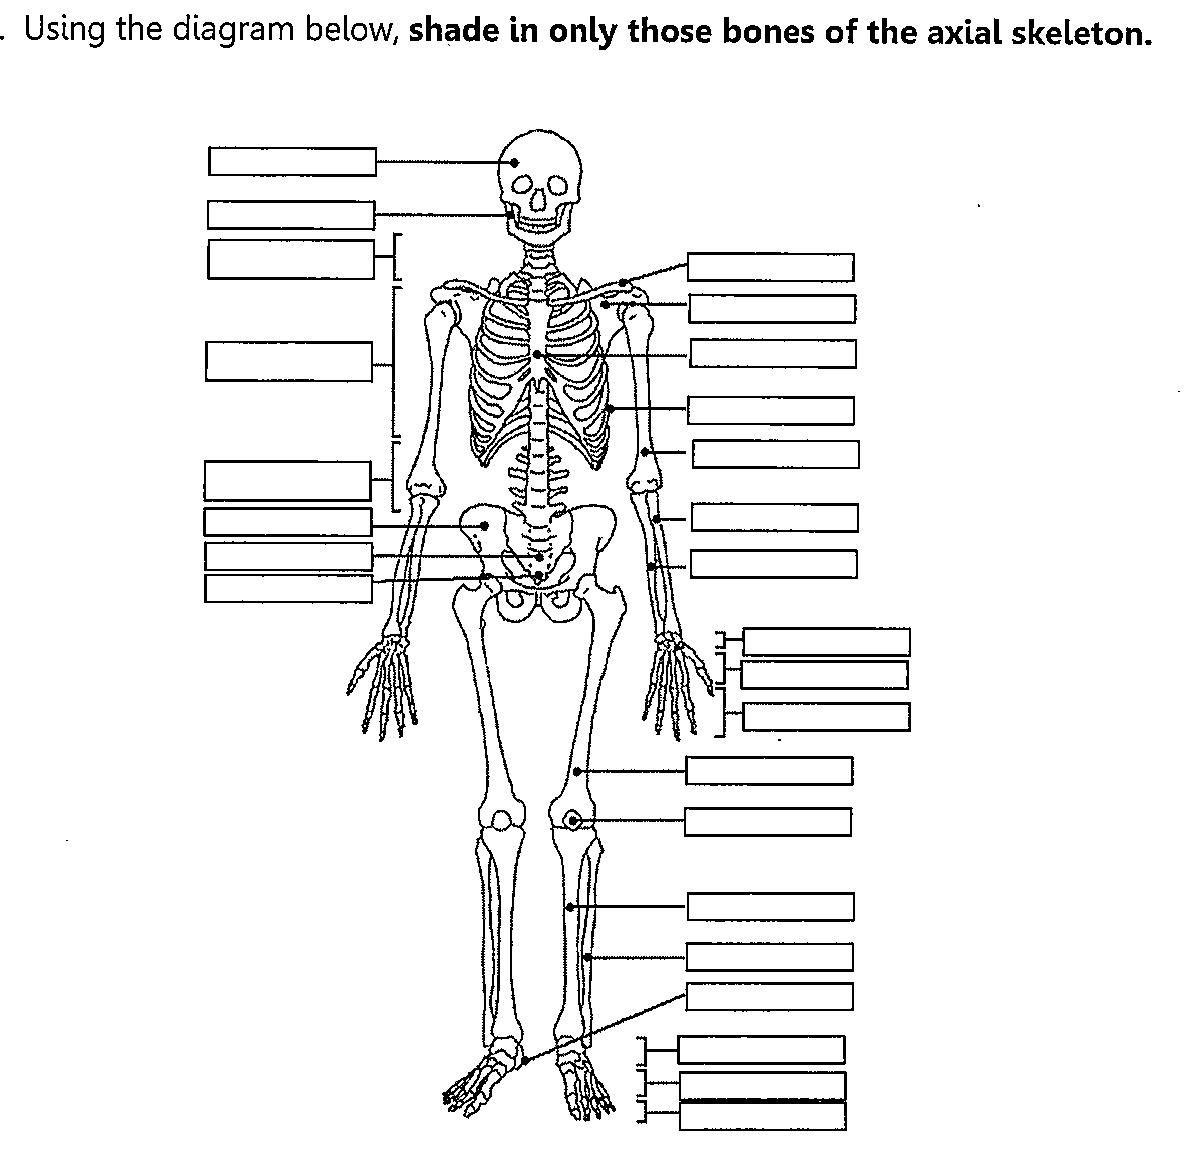 Skeletal System Fill In The Blank Worksheets